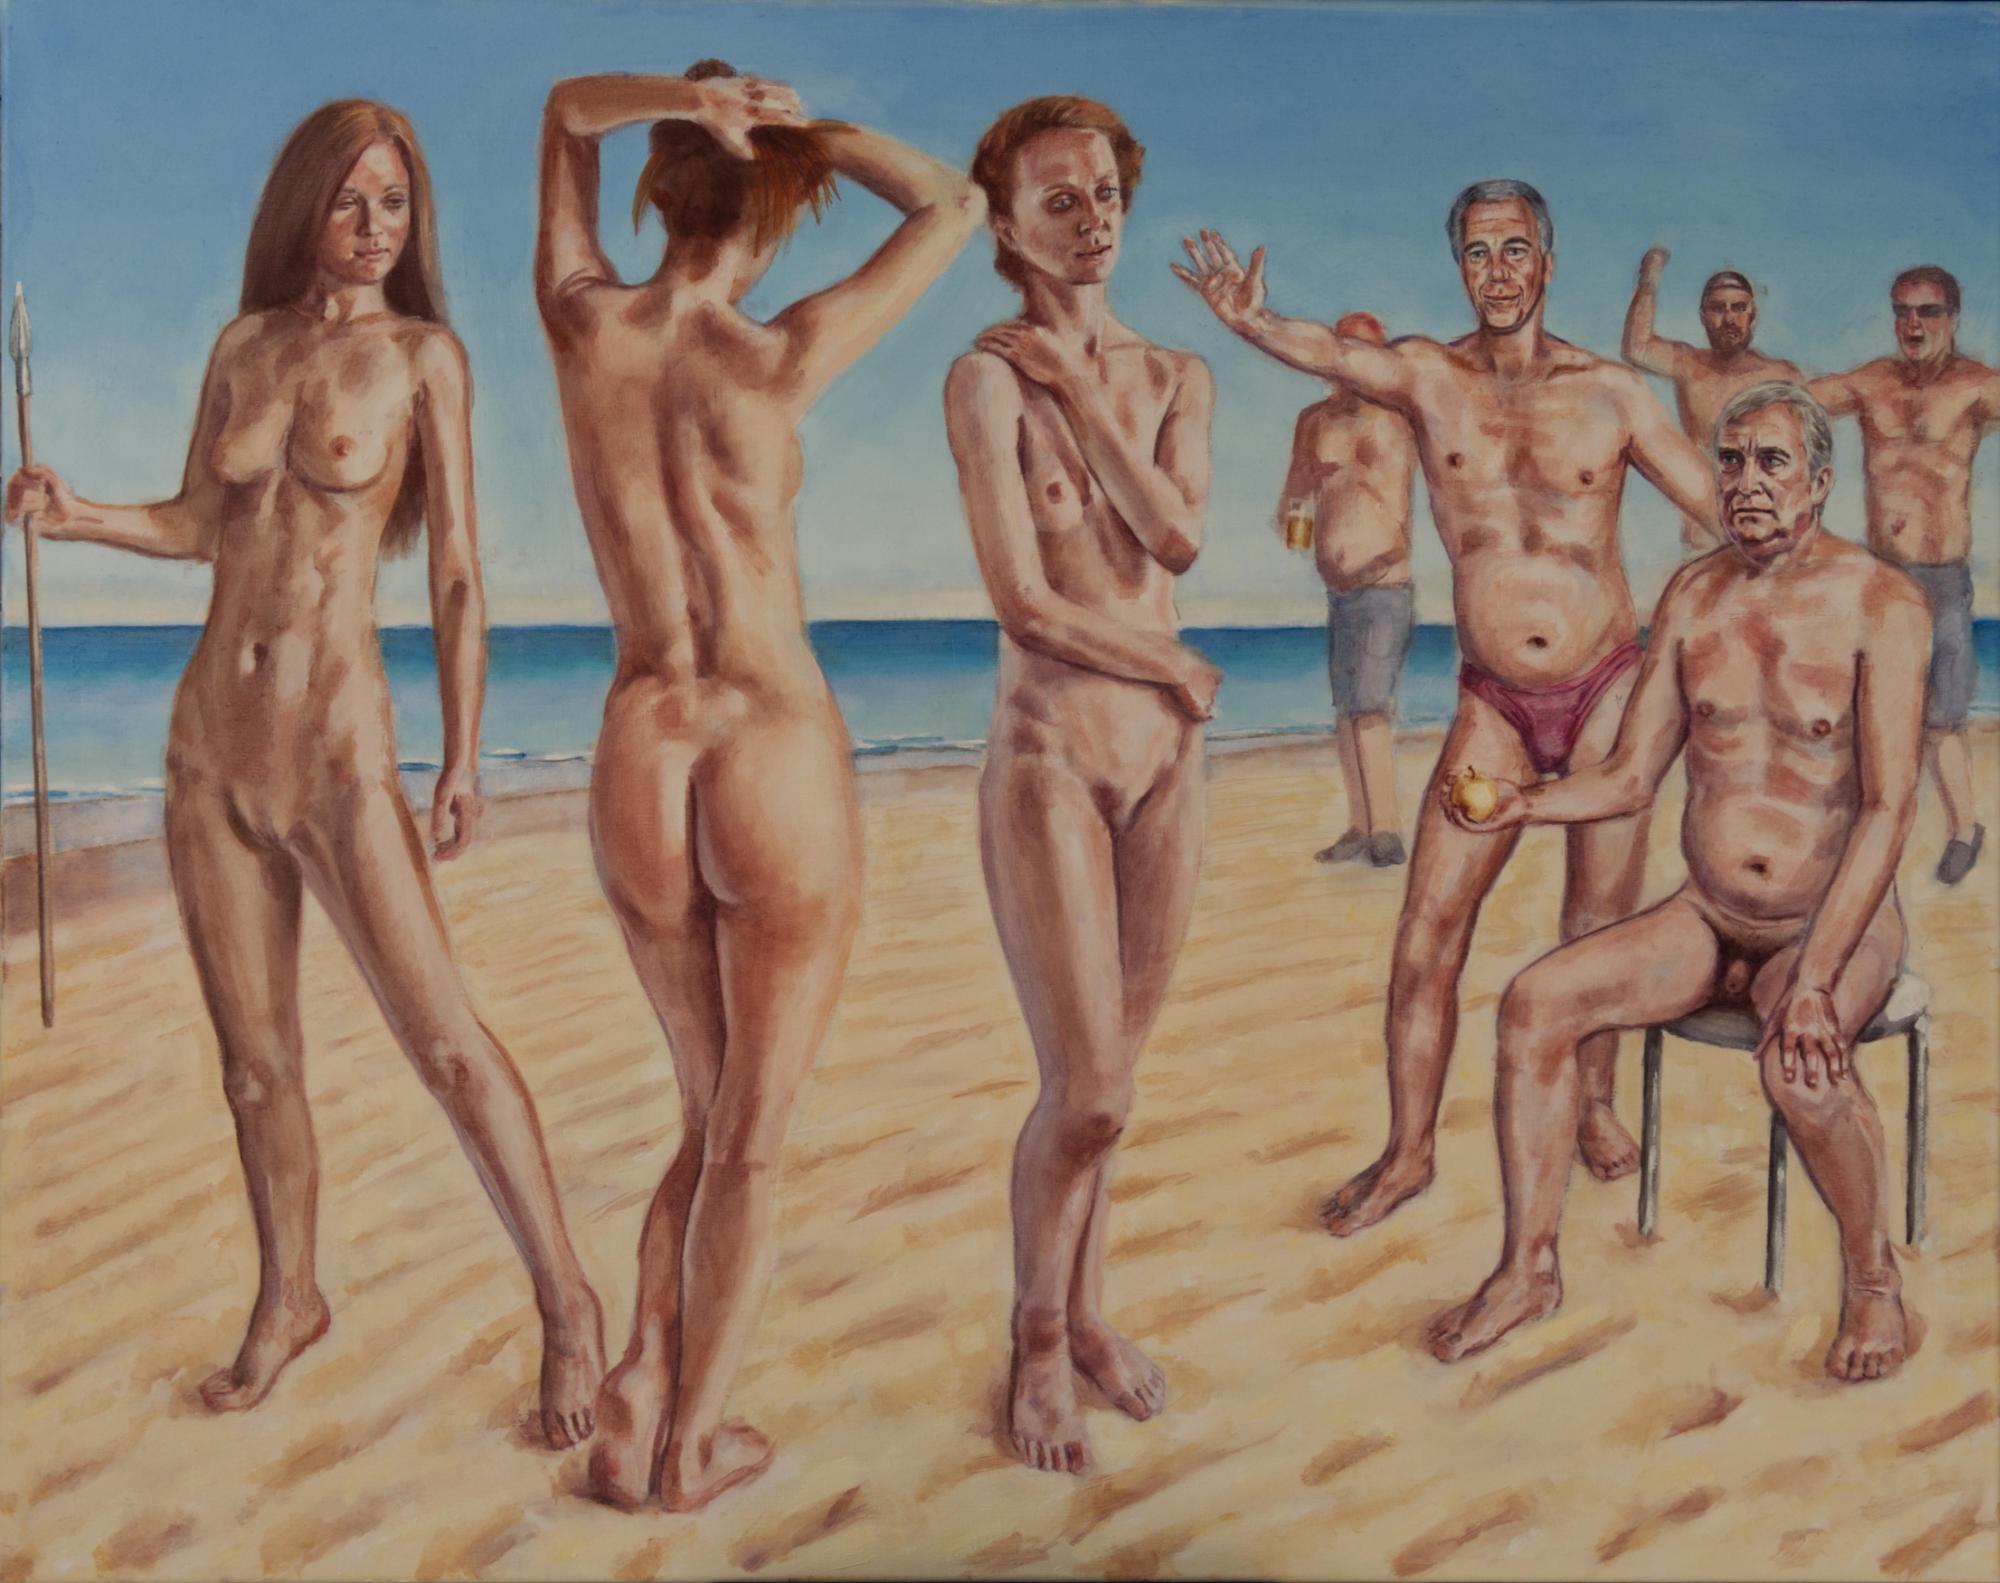 judgement of men oil painting